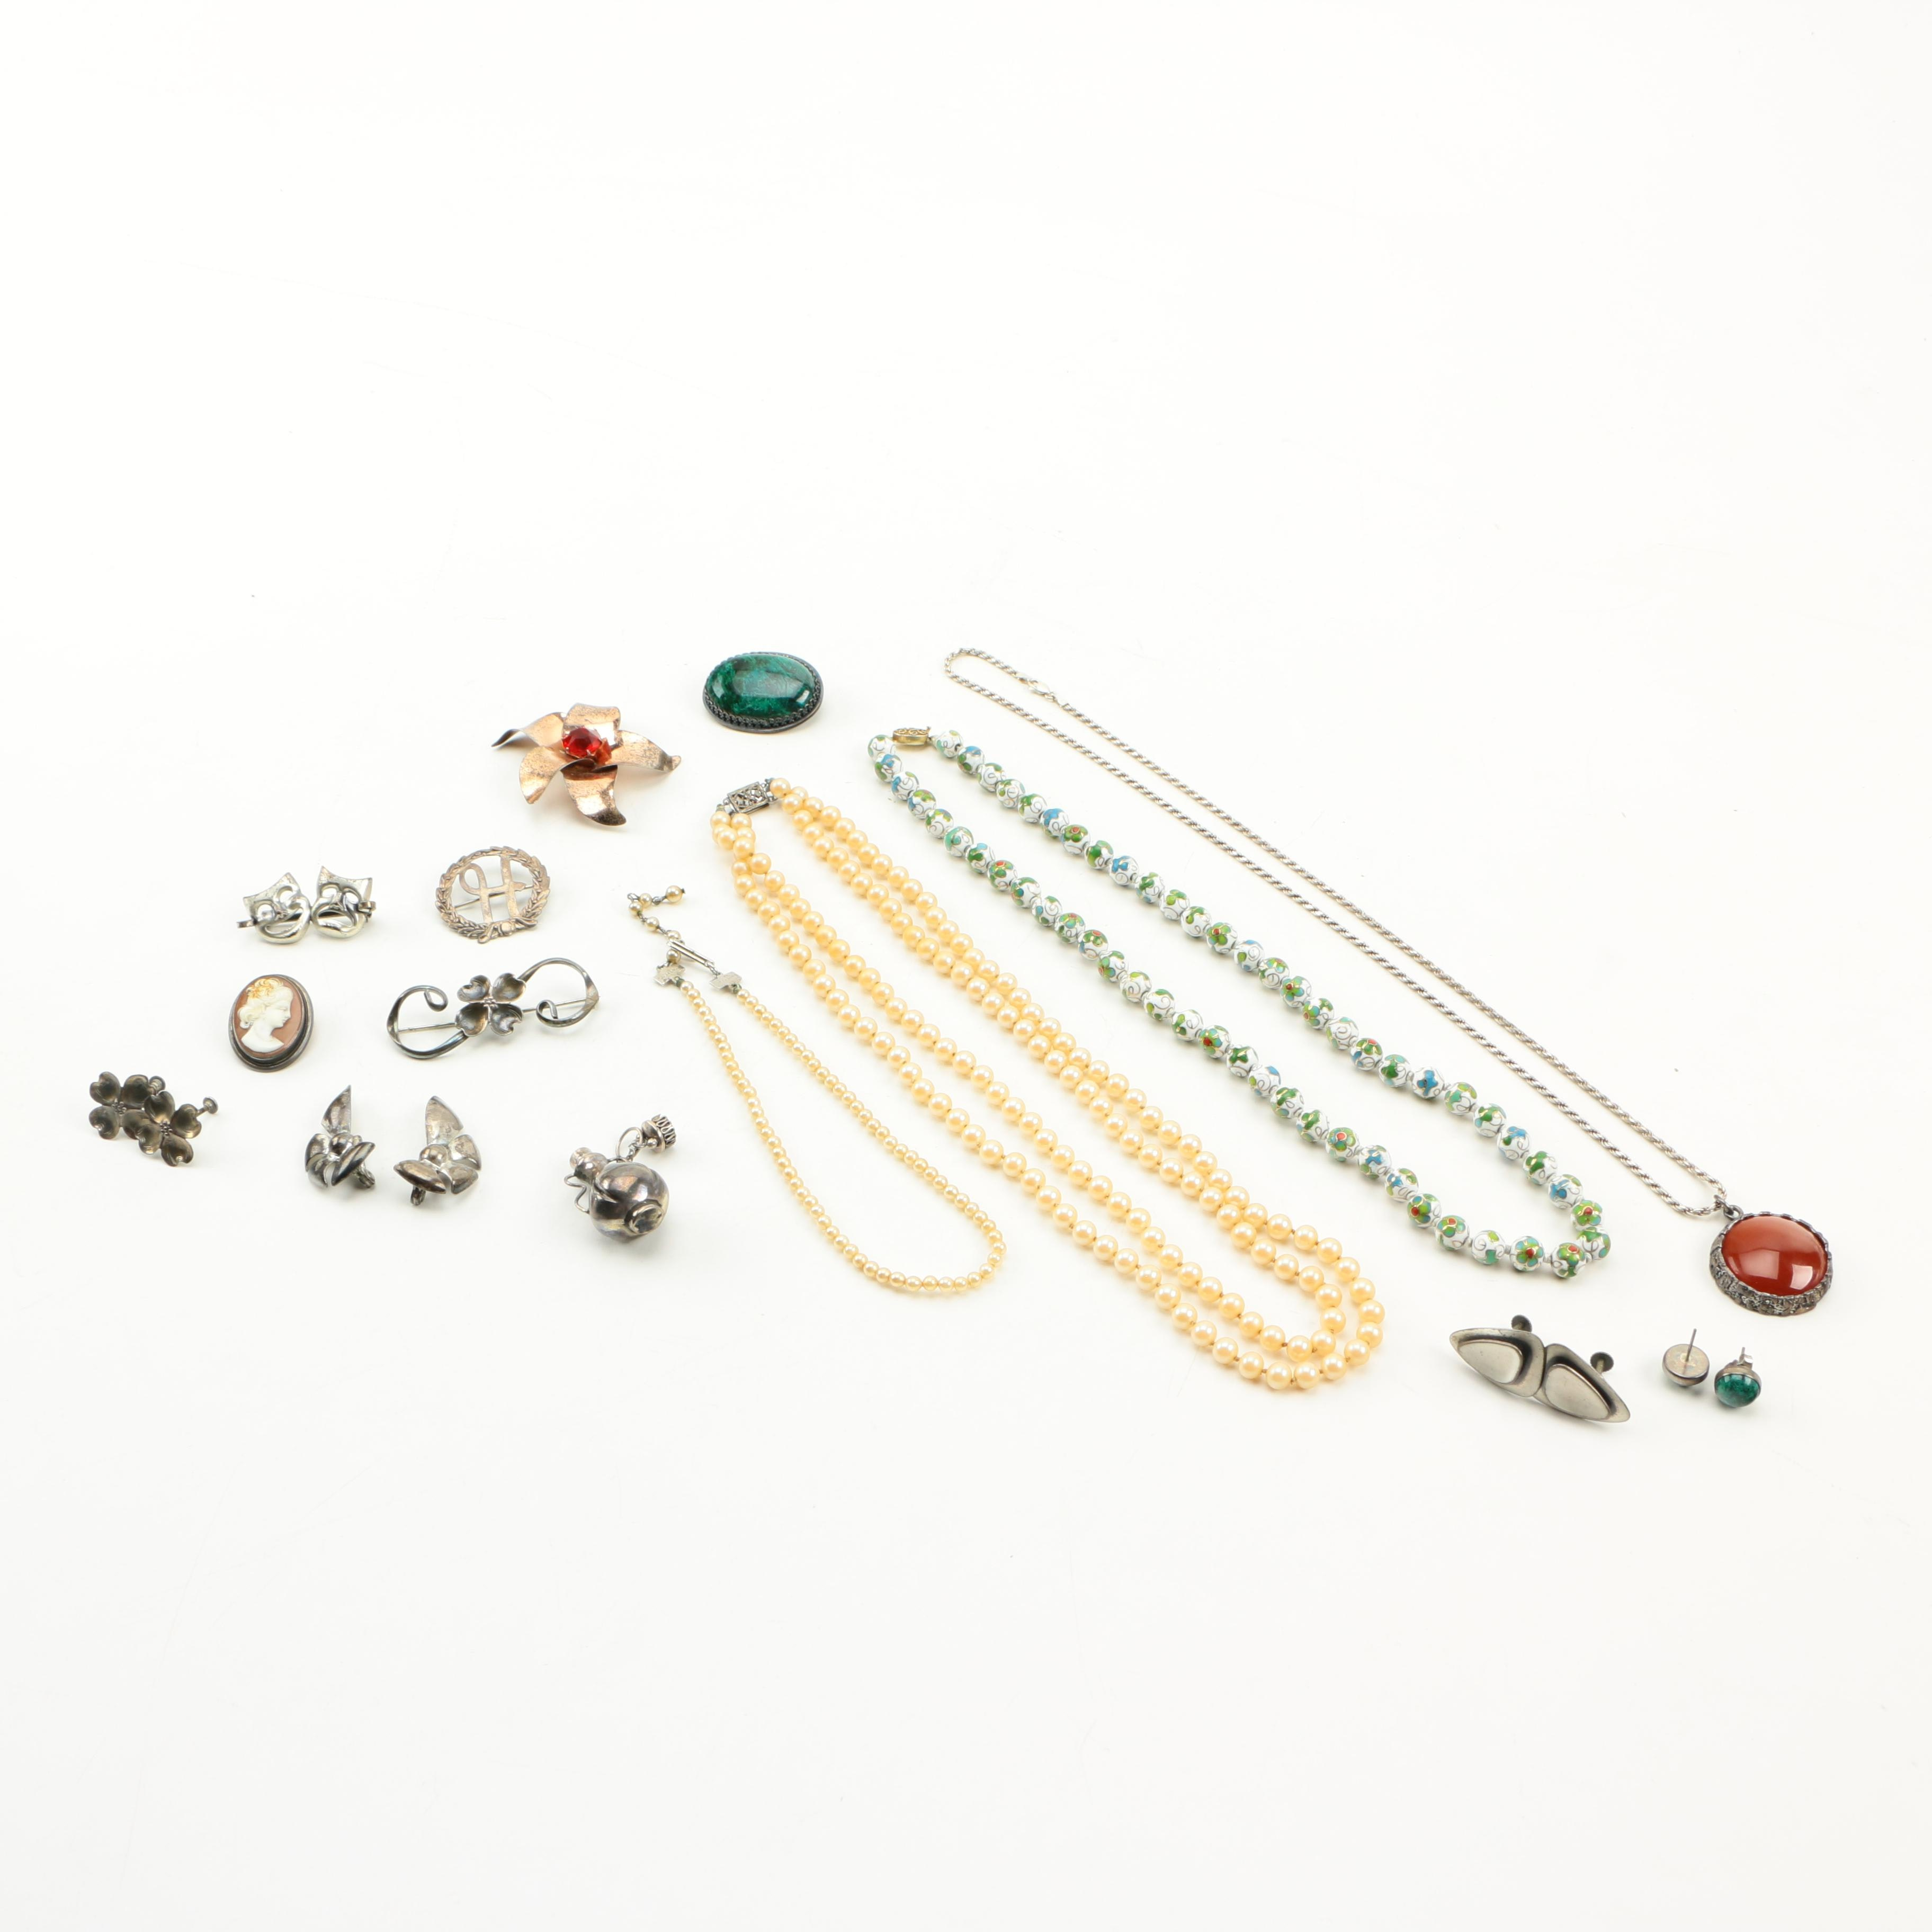 Sterling Silver Jewelry Including a Sterling by Jordan Brooch